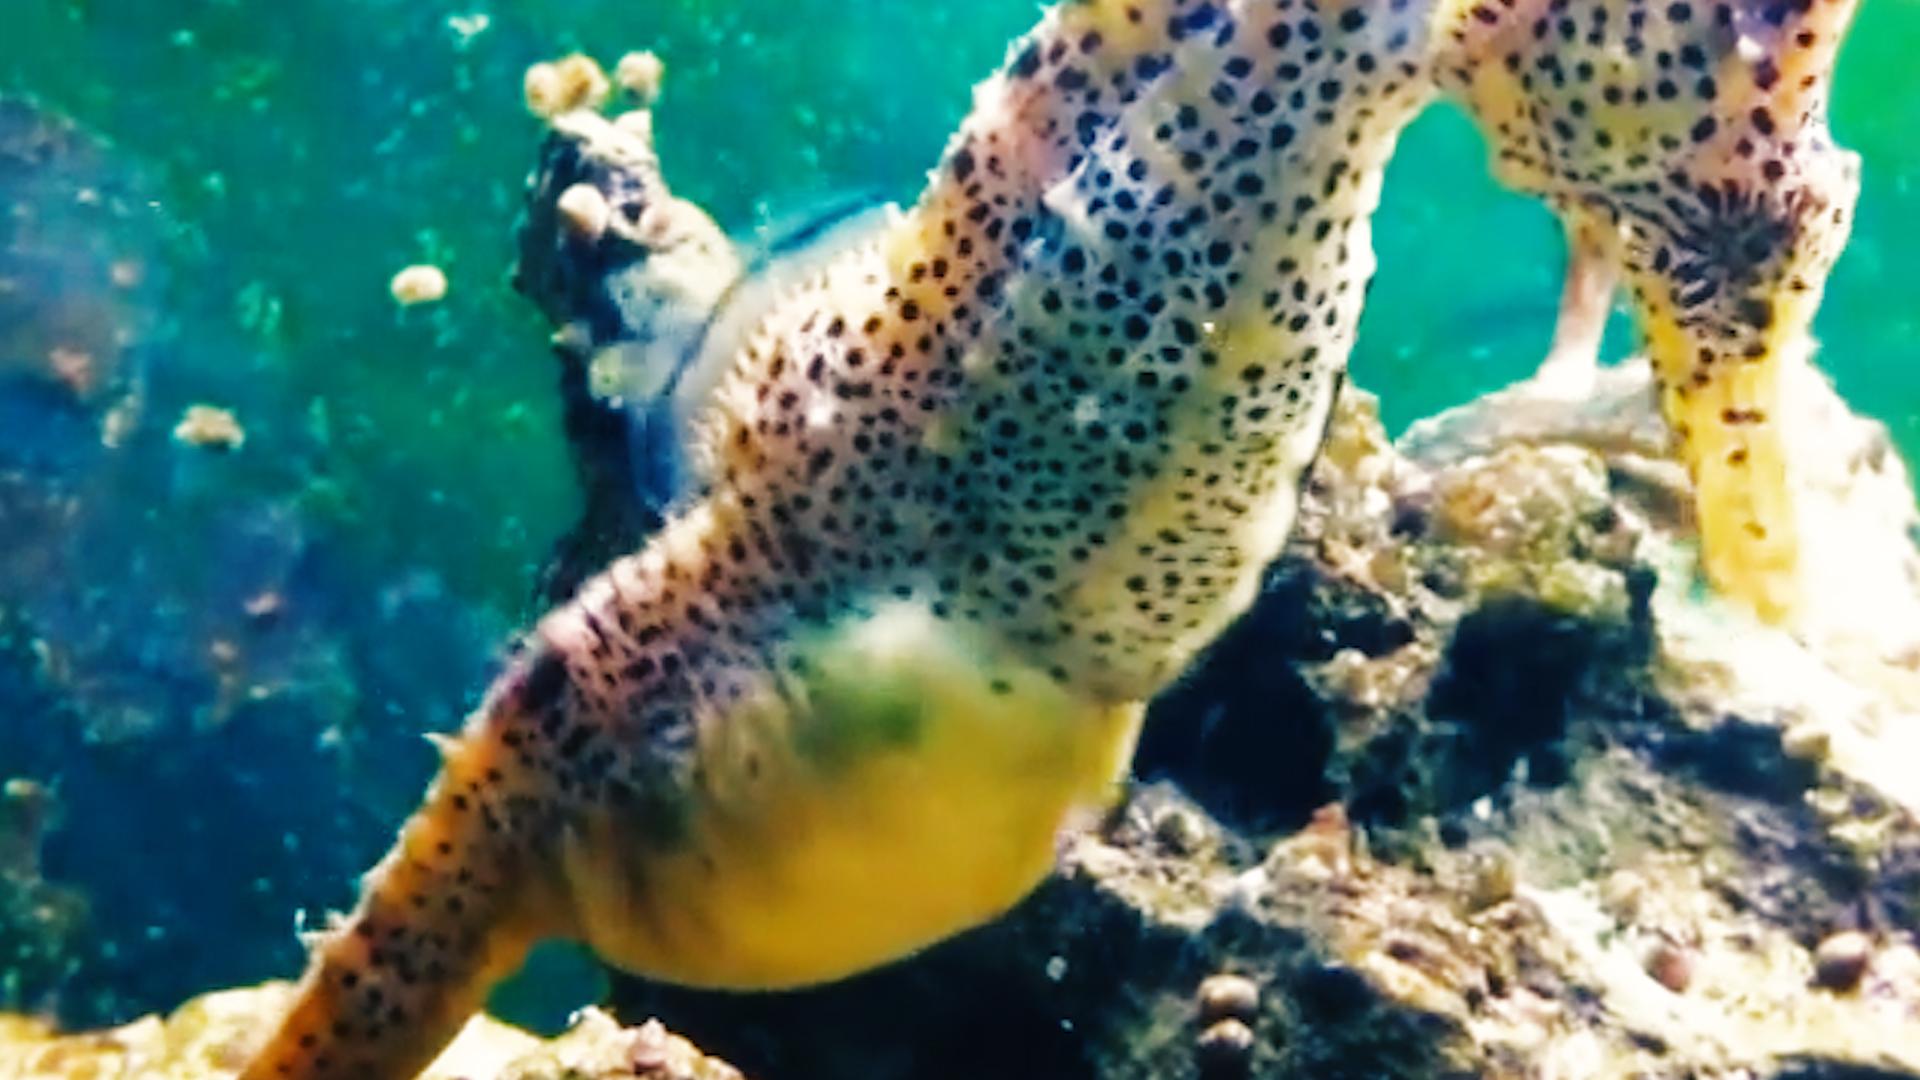 Male seahorse pregnancy